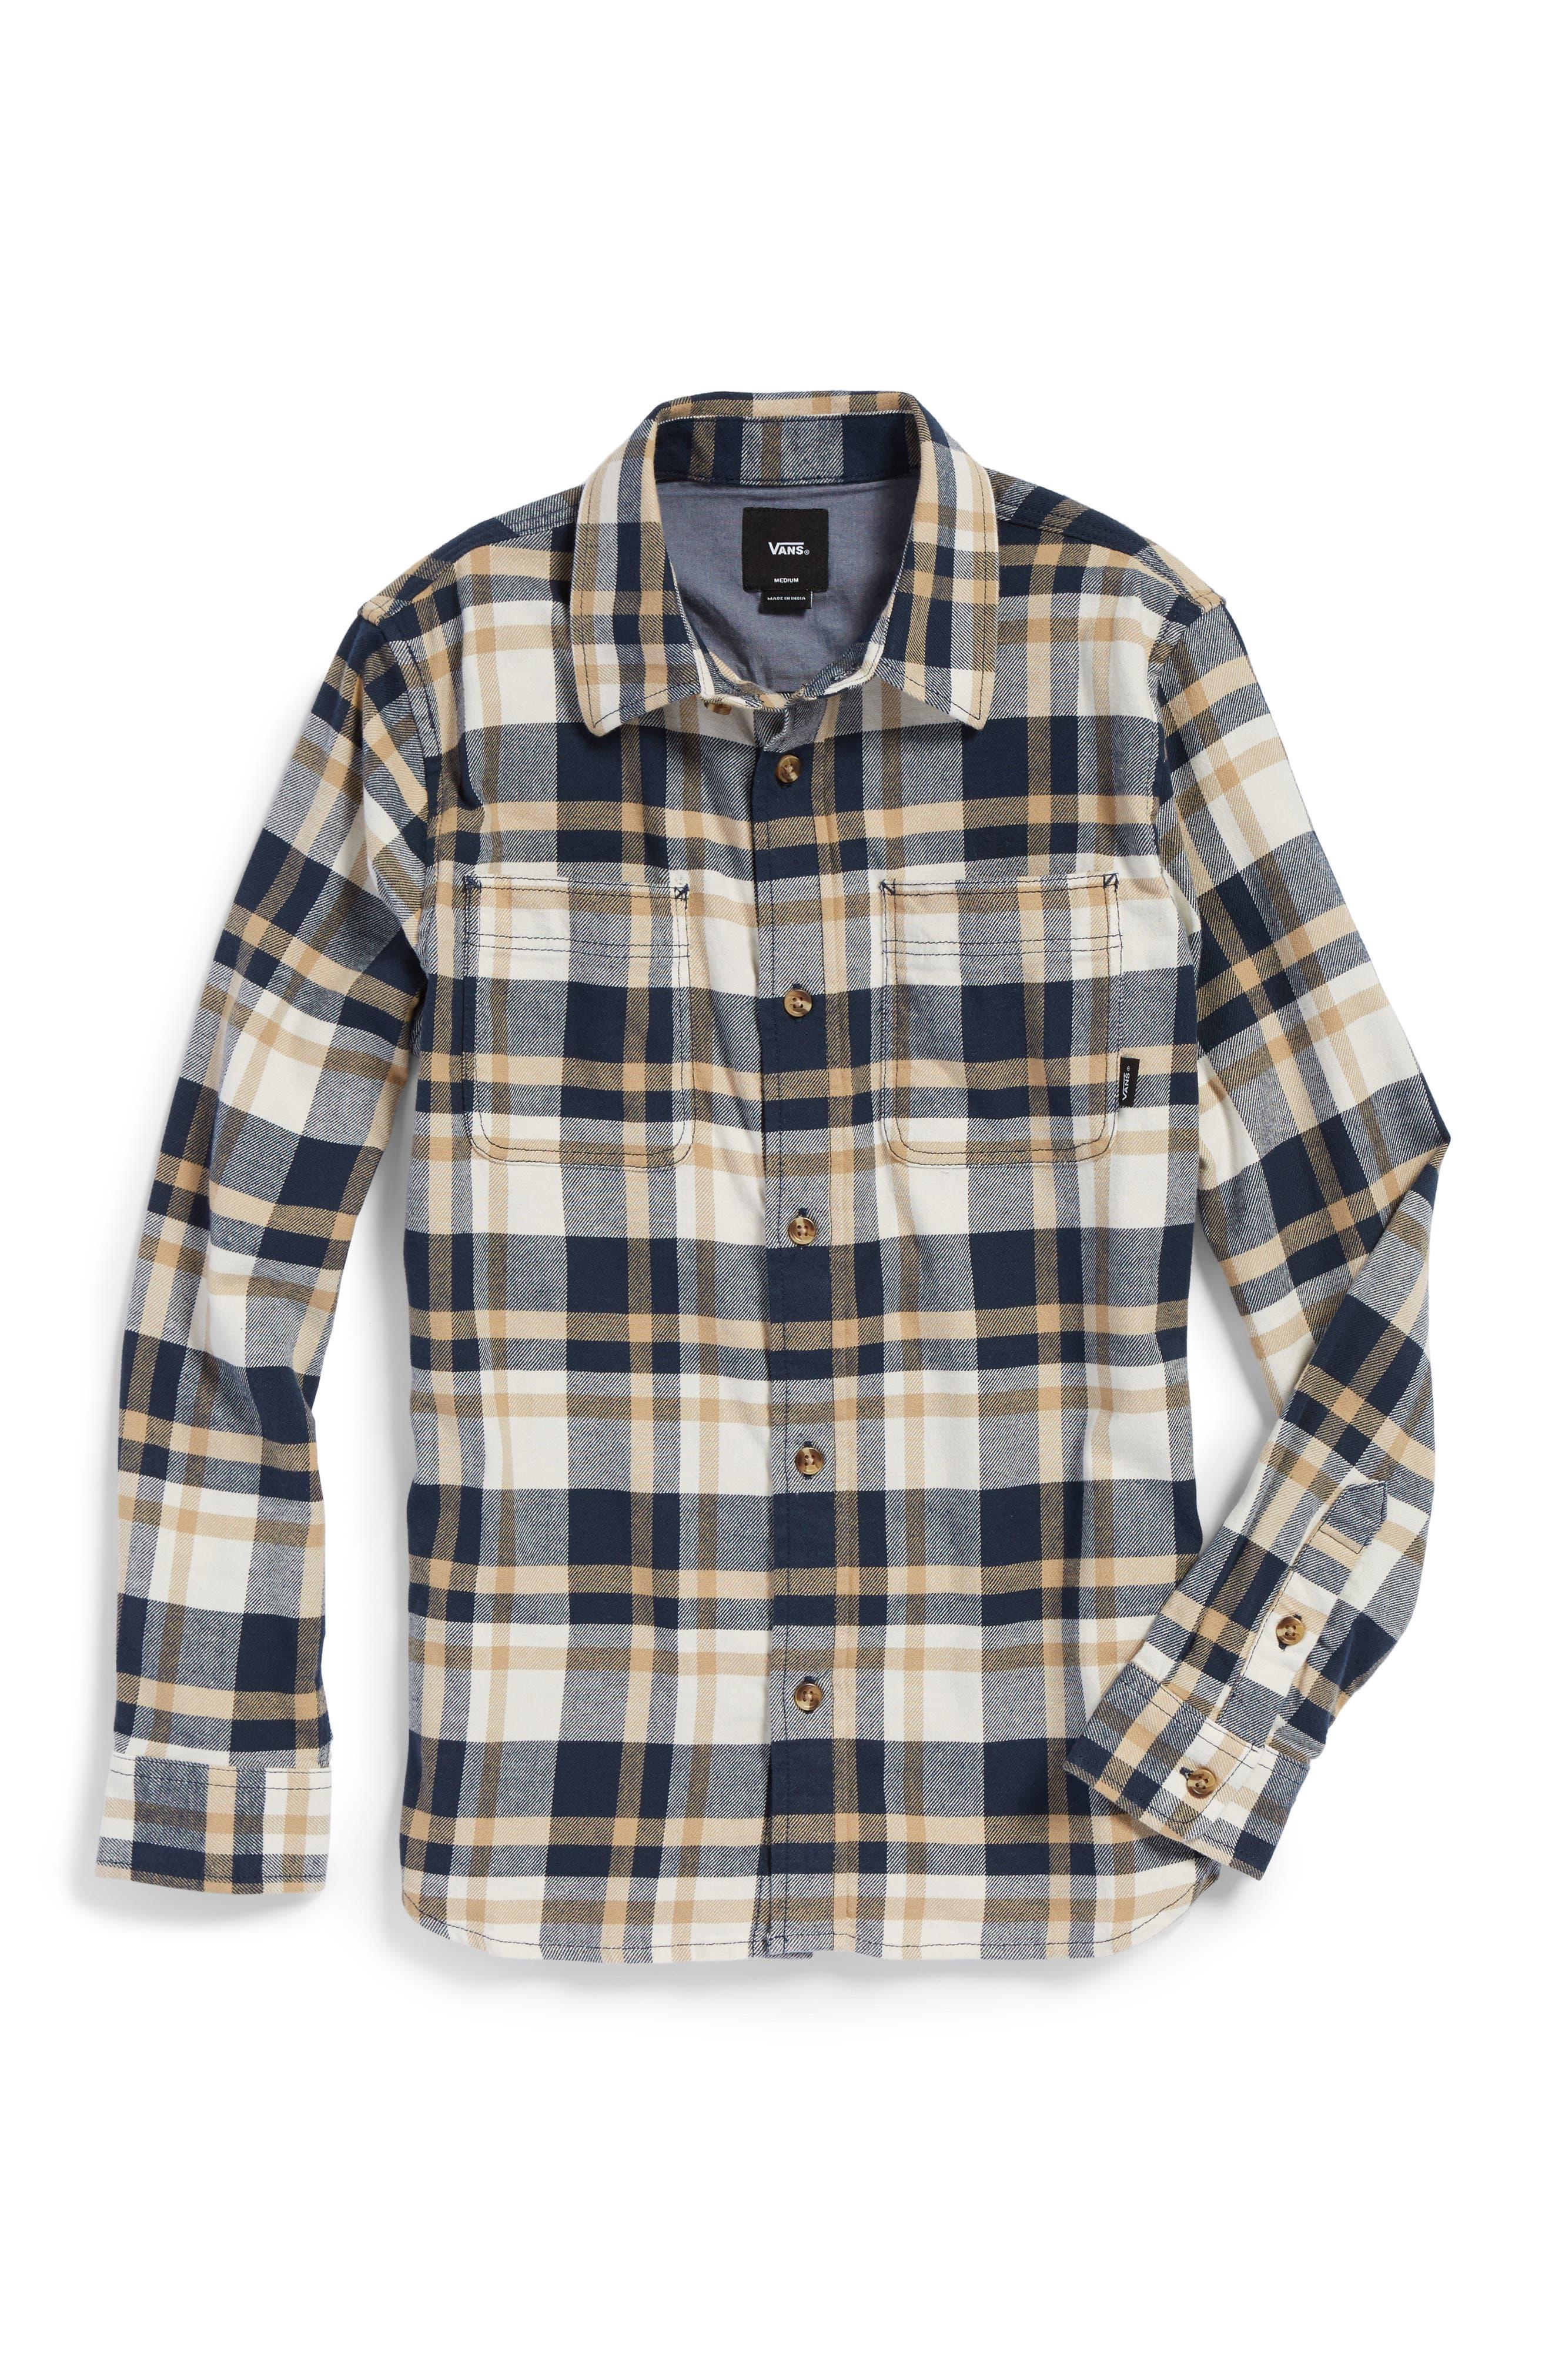 Vans Banfield Plaid Flannel Shirt (Big Boys)